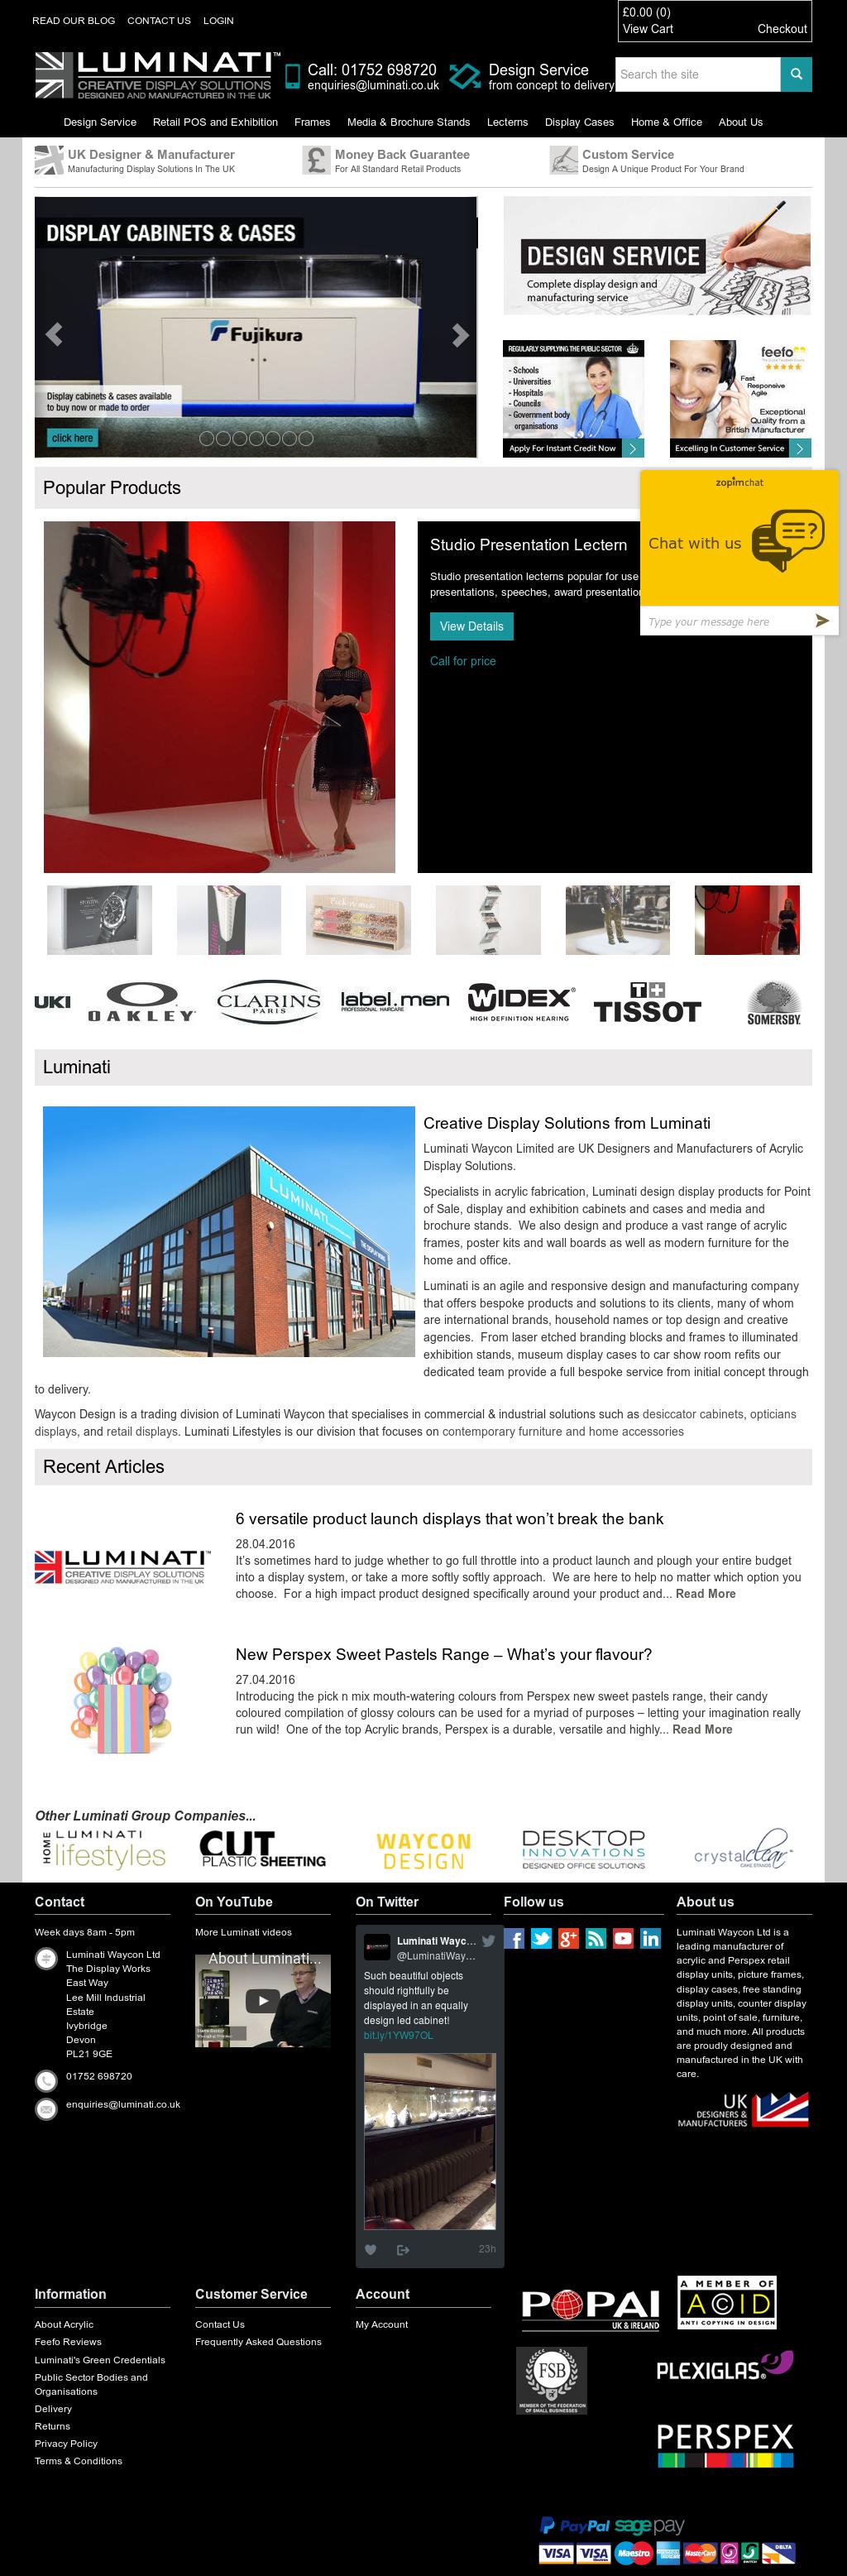 Luminati Competitors, Revenue and Employees - Owler Company